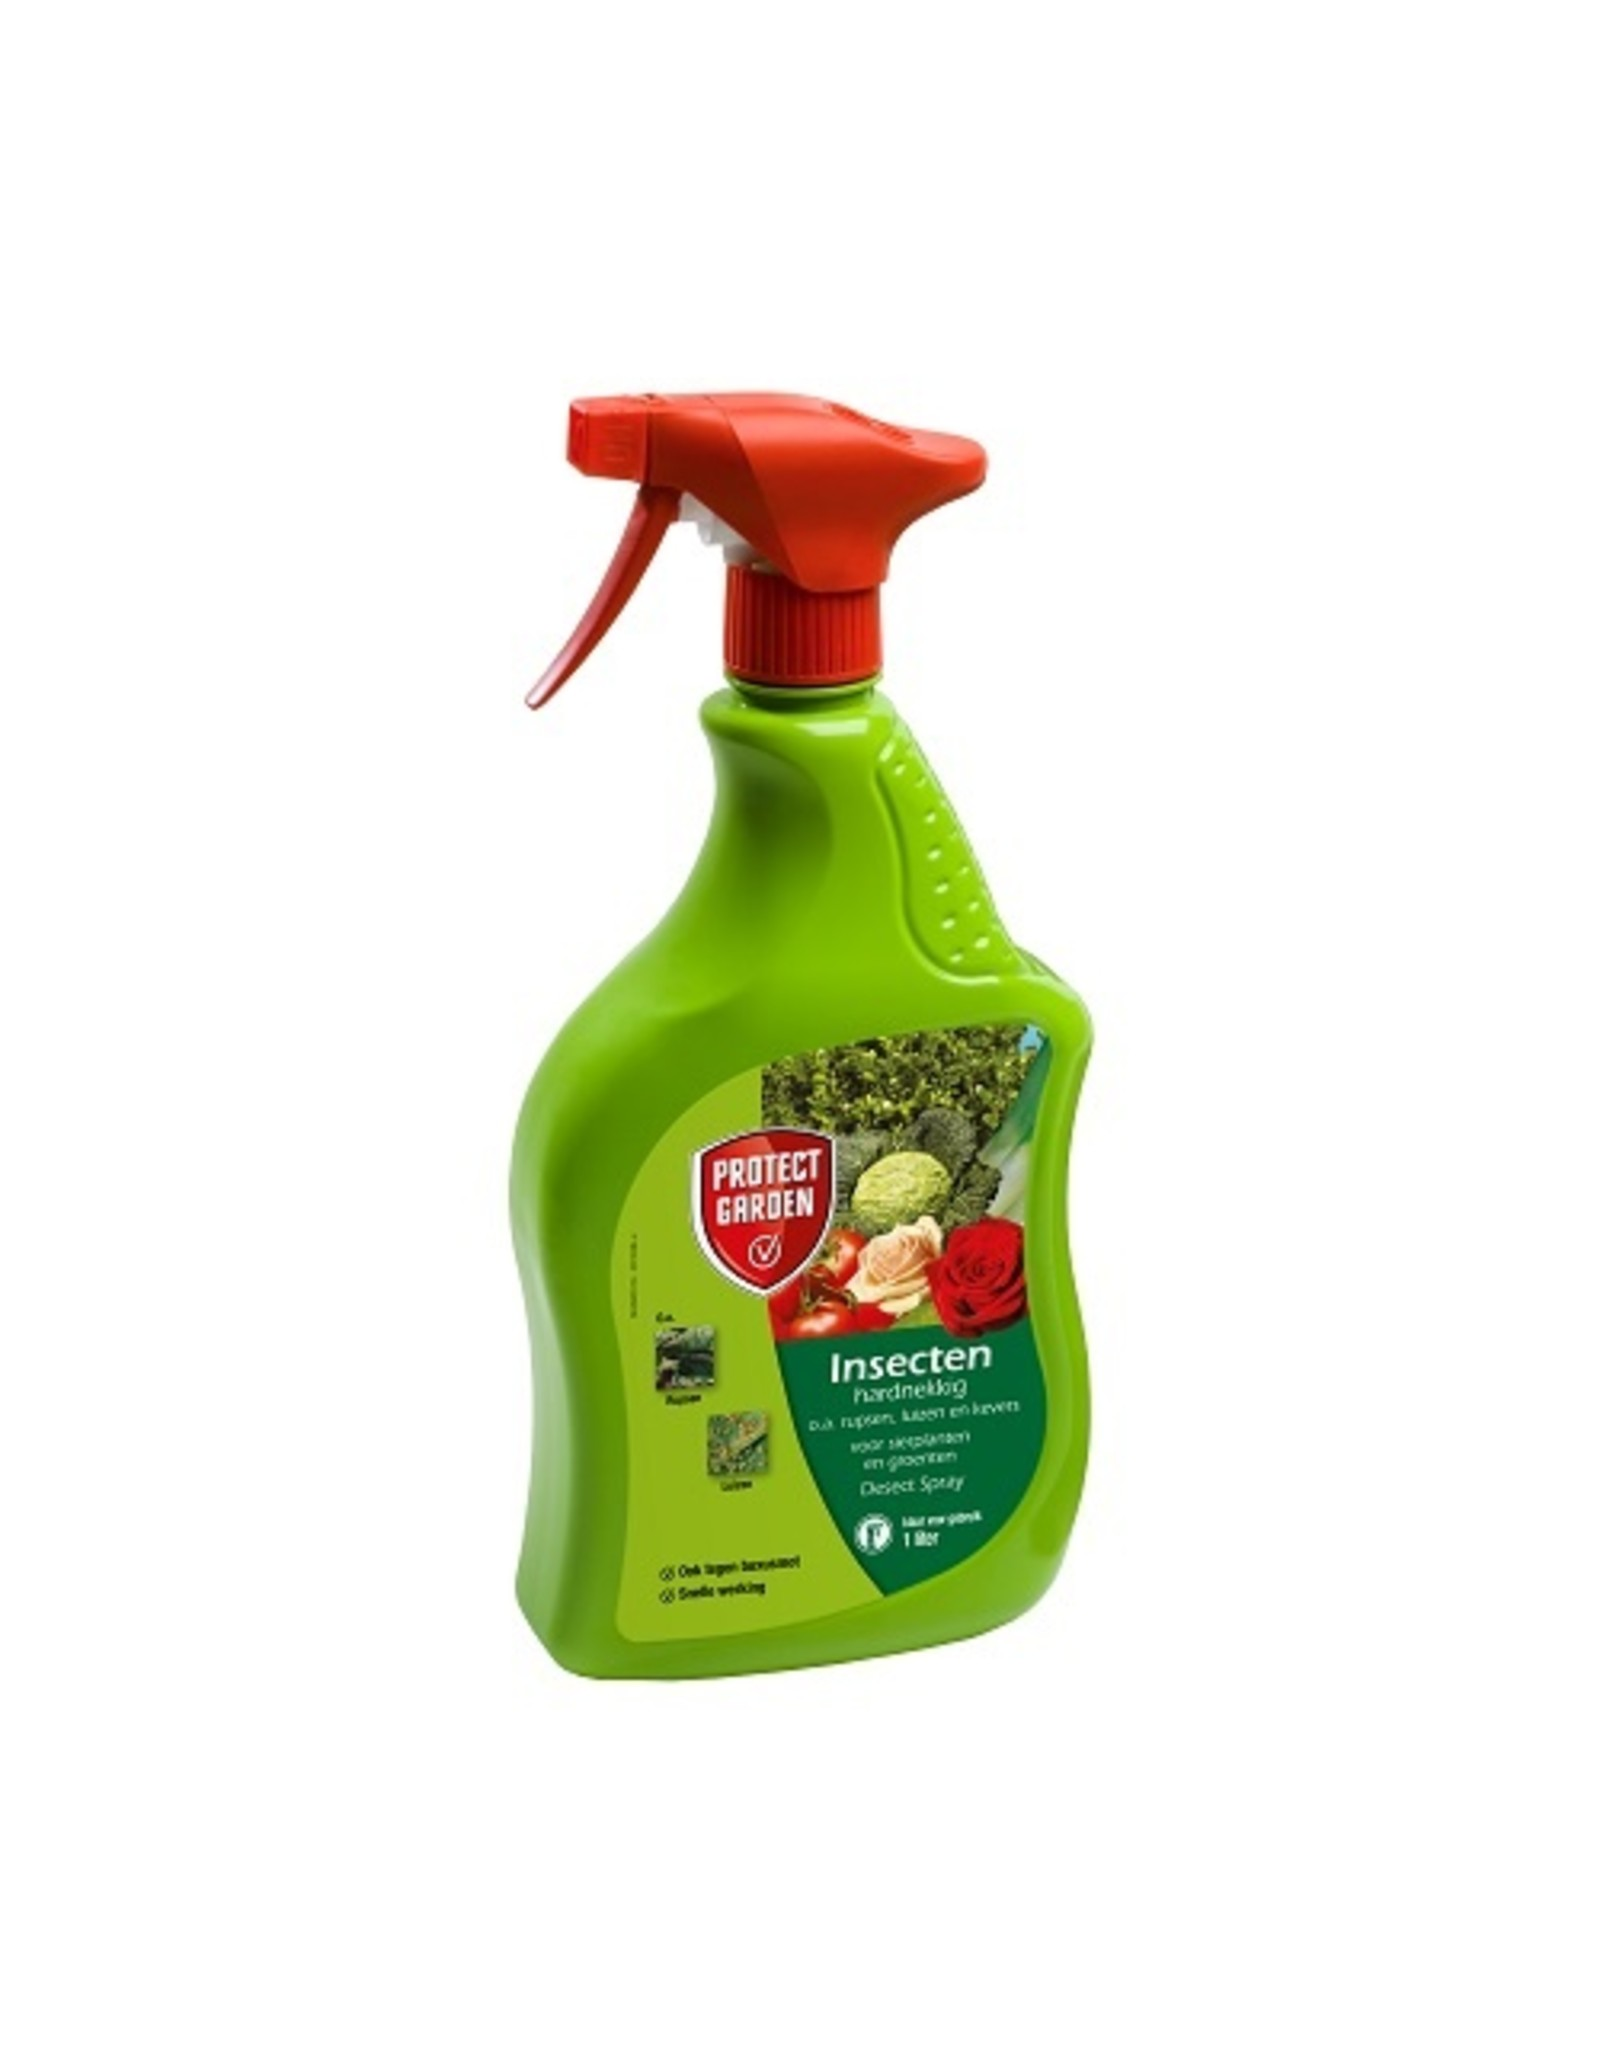 Protect Garden Desect Insectenbestrijding 1 liter spray